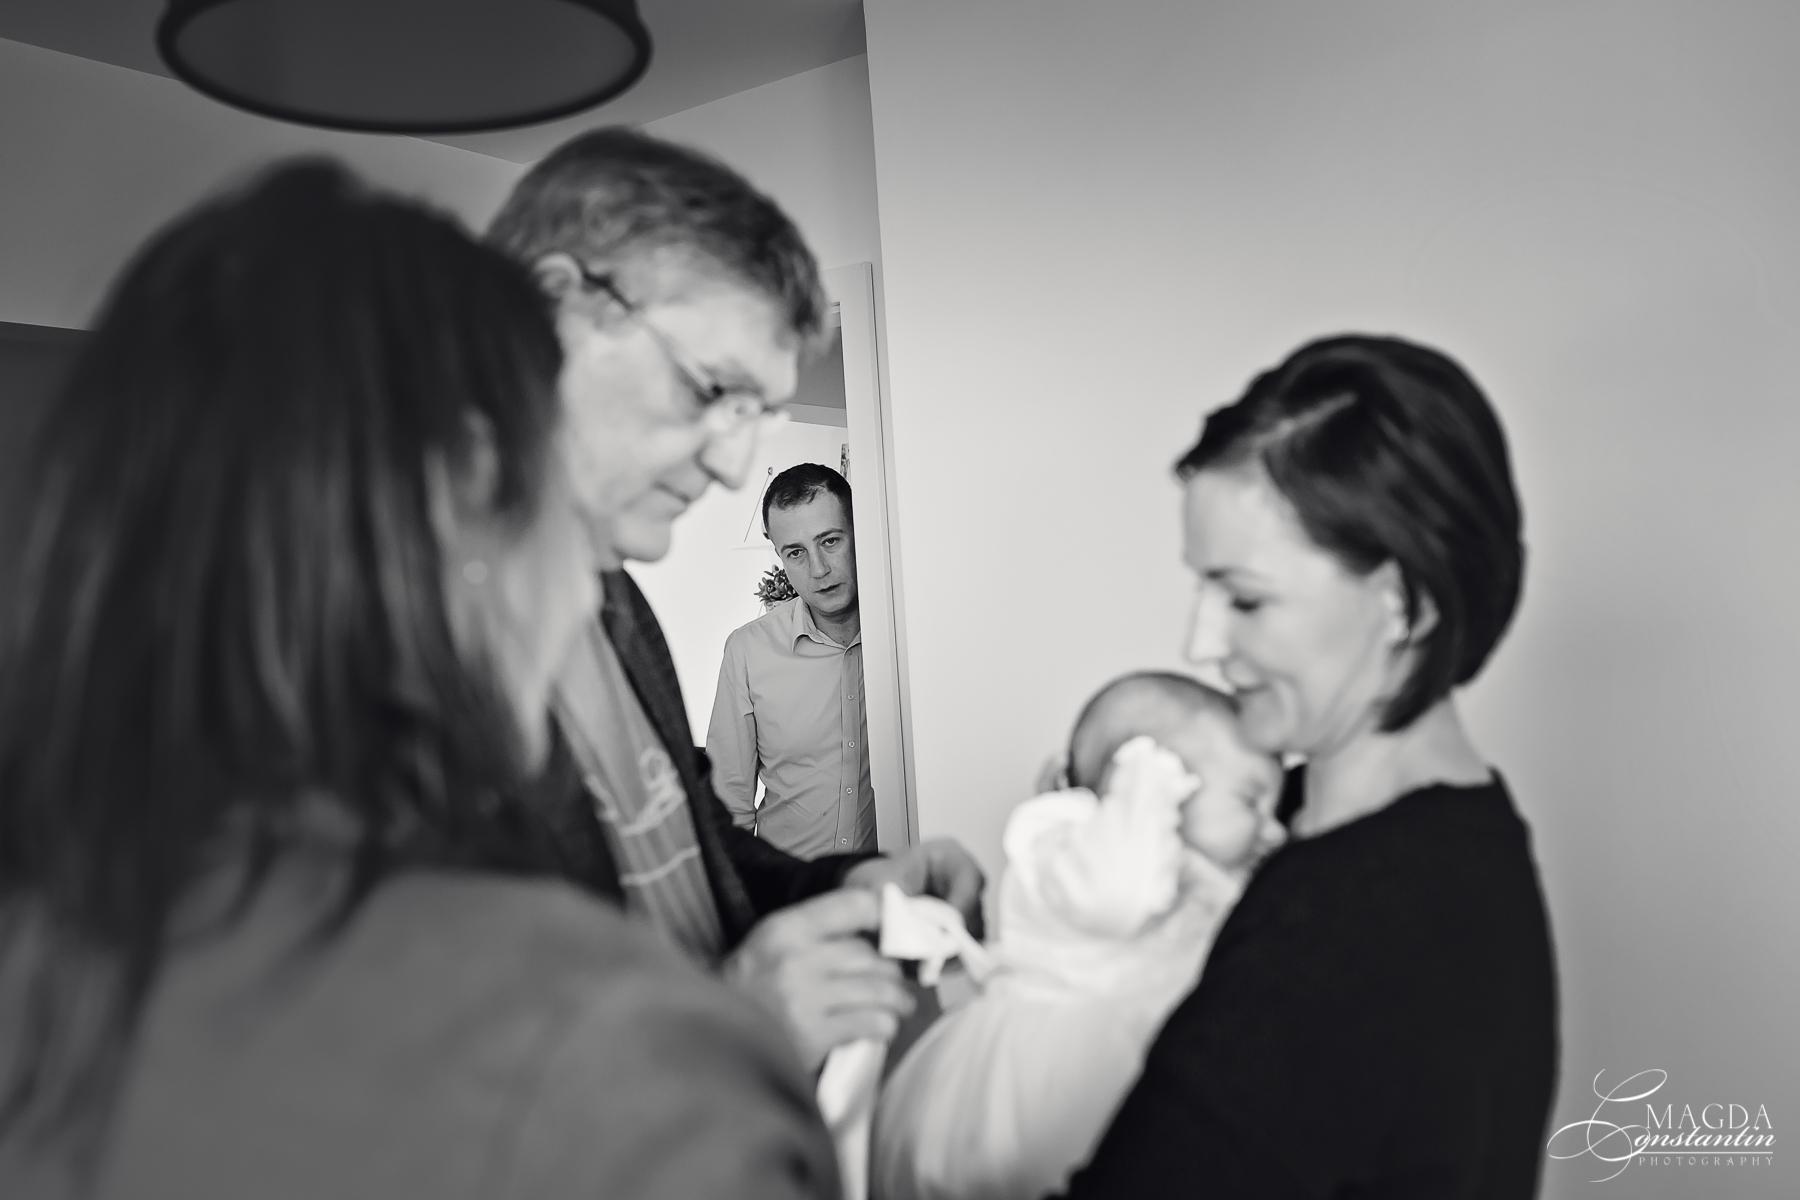 Fotograf la botezul mariei sedinta foto acasa in brate la mama nasul nasa alb-negru